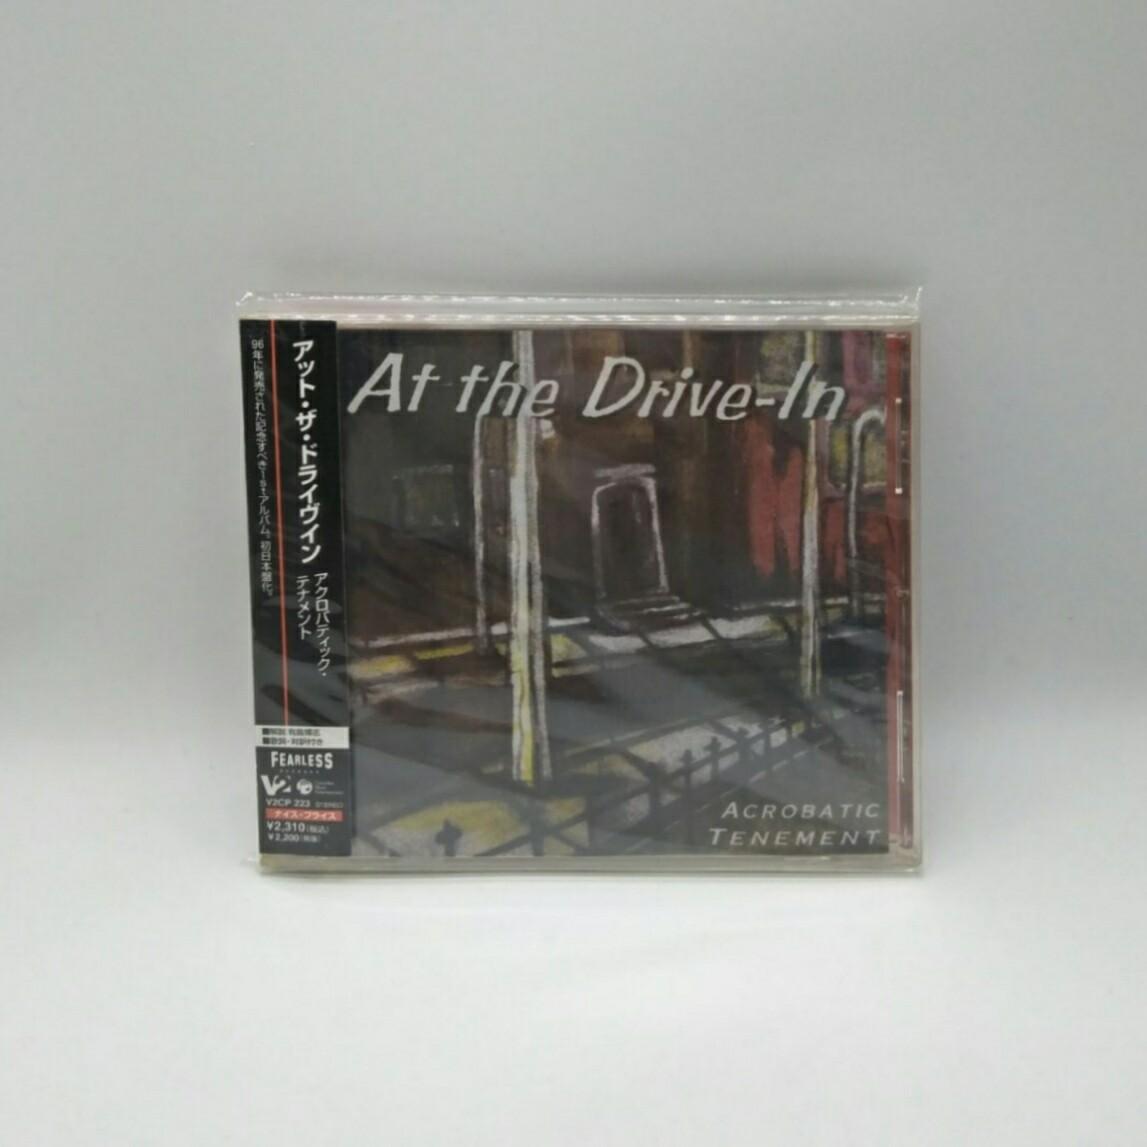 [USED] AT THE DRIVE IN -ACROBATIC TENEMENT- CD (JAPAN PRESS)